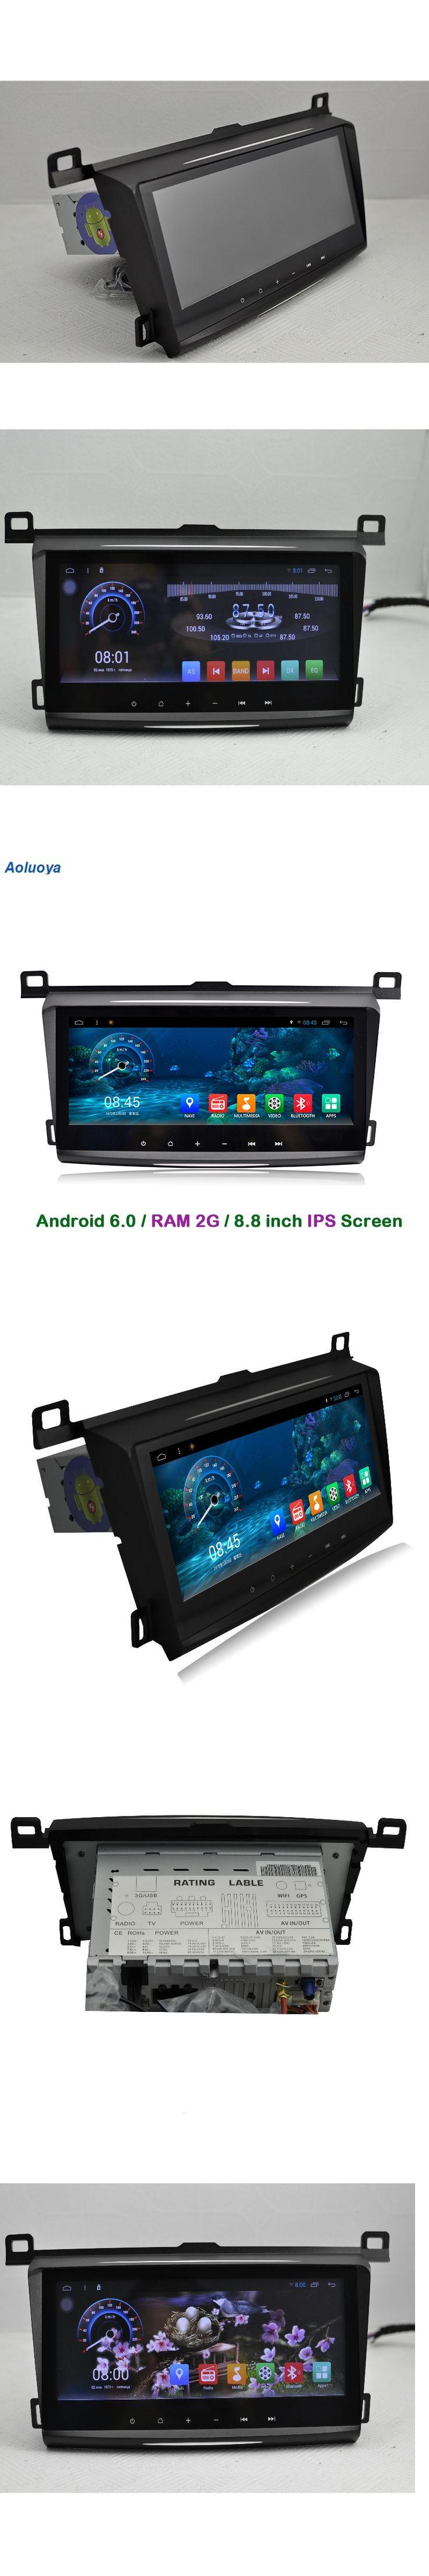 Aoluoya RAM 2G 1280*480 Android 6.0 CAR DVD GPS Navigation For Toyota RAV4 RAV 4 2013 2014 2015 2016 Audio Radio multimedia WIFI